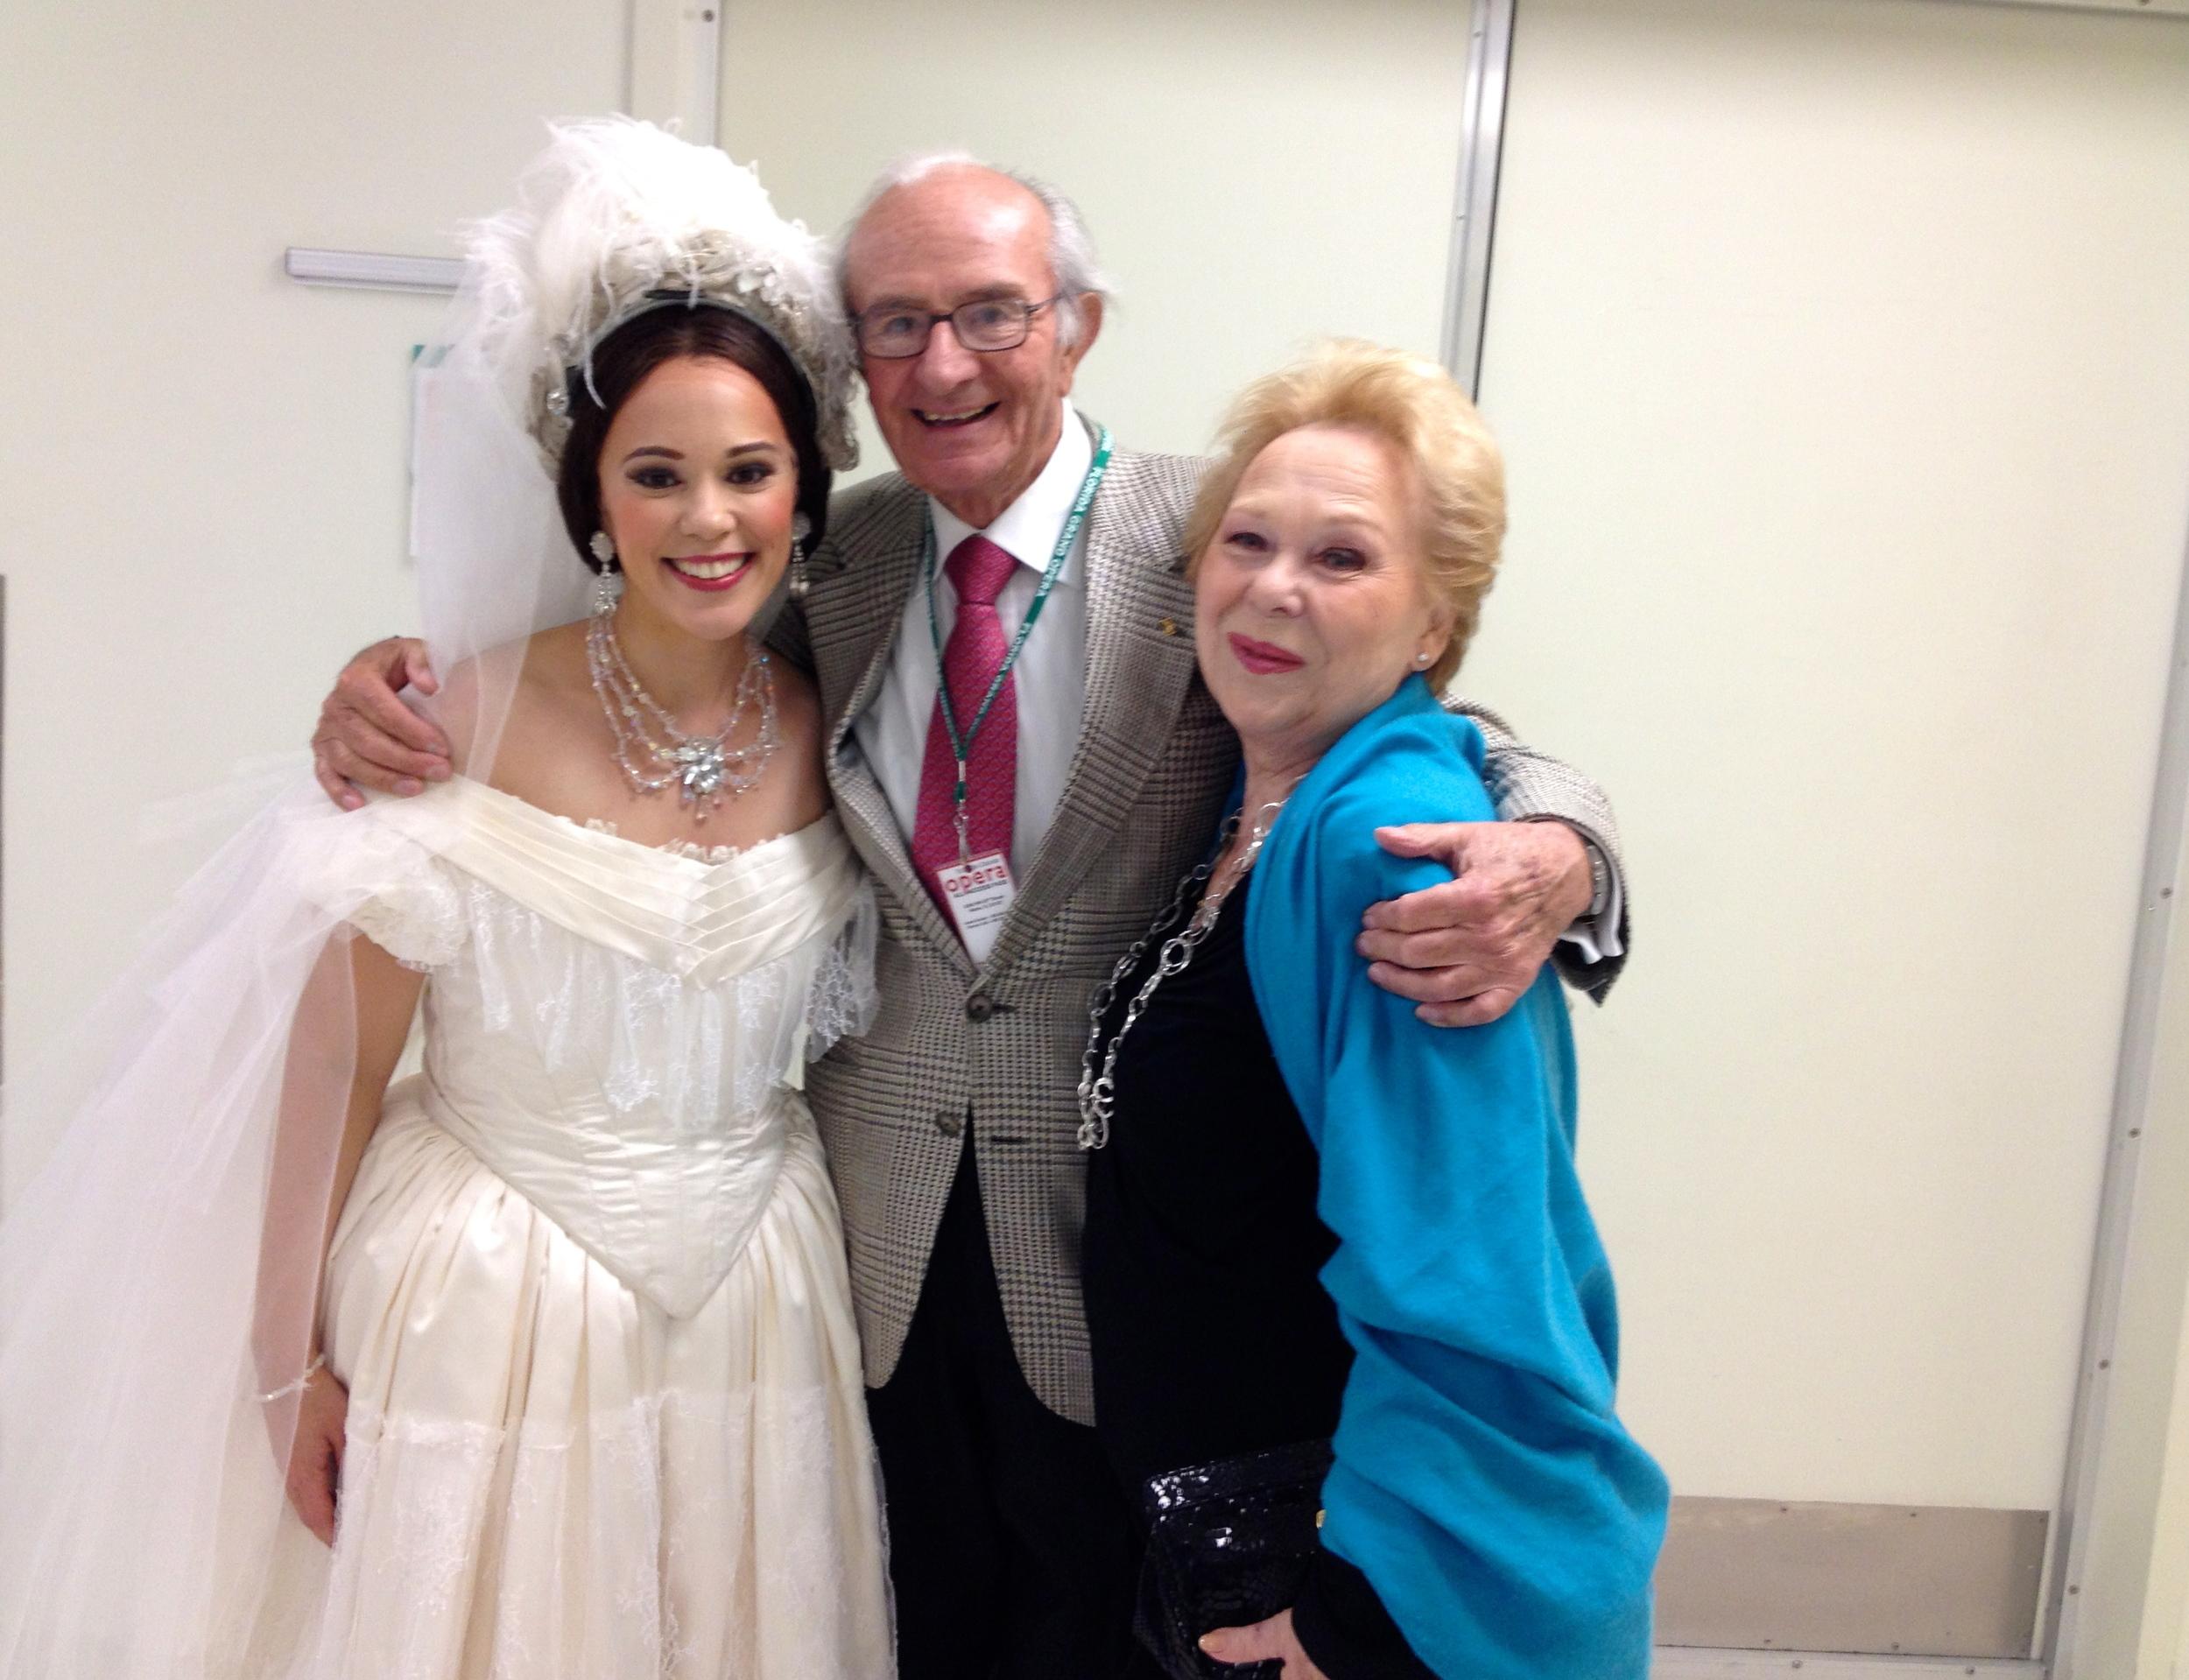 Backstage with Renata Scotto and Lorenzo Anselmi